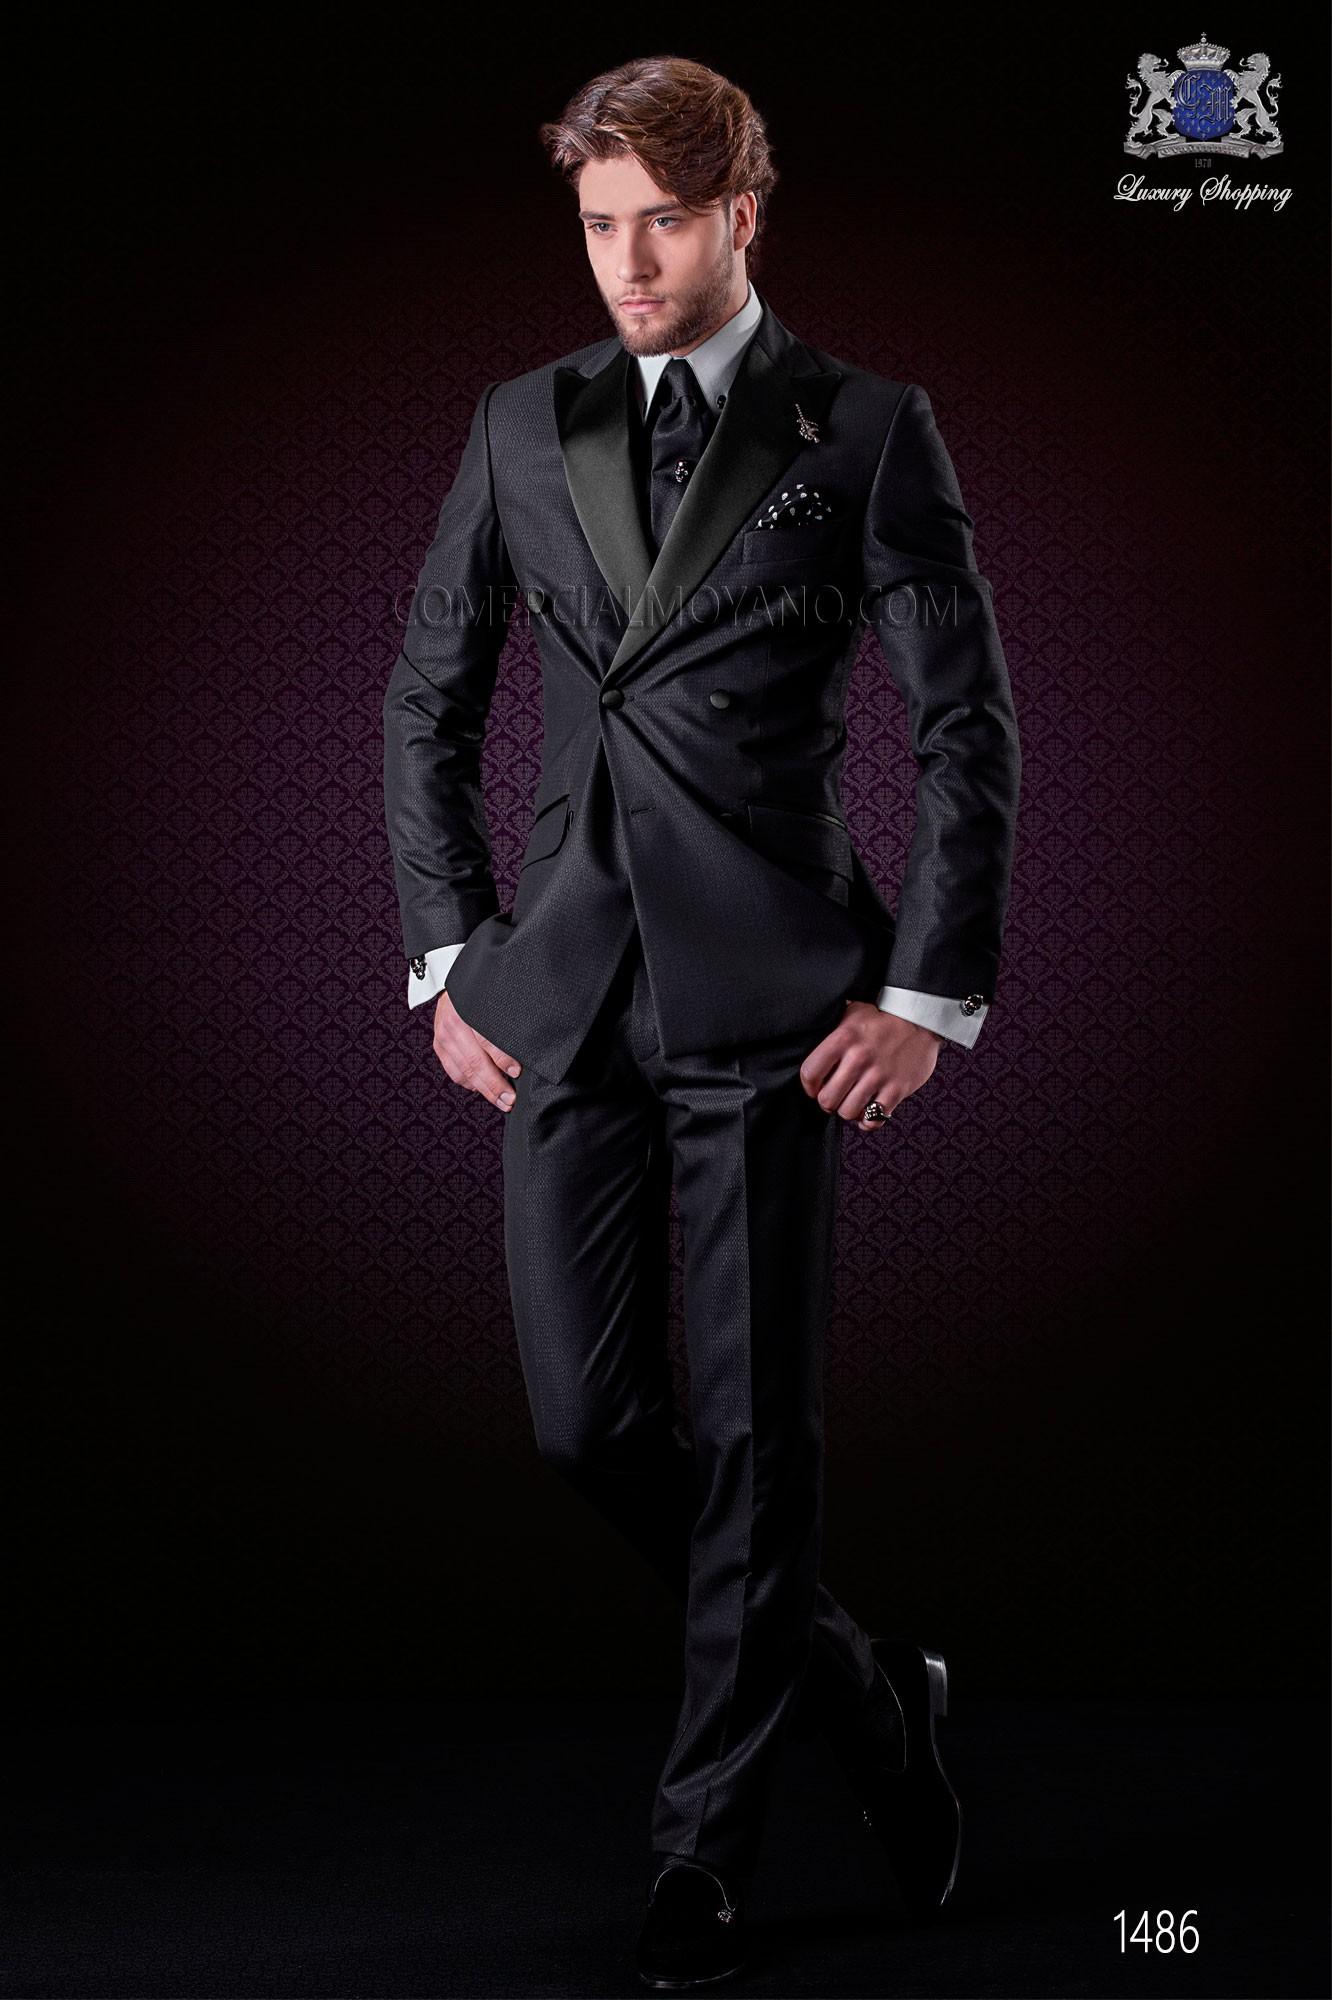 Double breasted black fashion groom suit slim fit, Ottavio Nuccio Gala